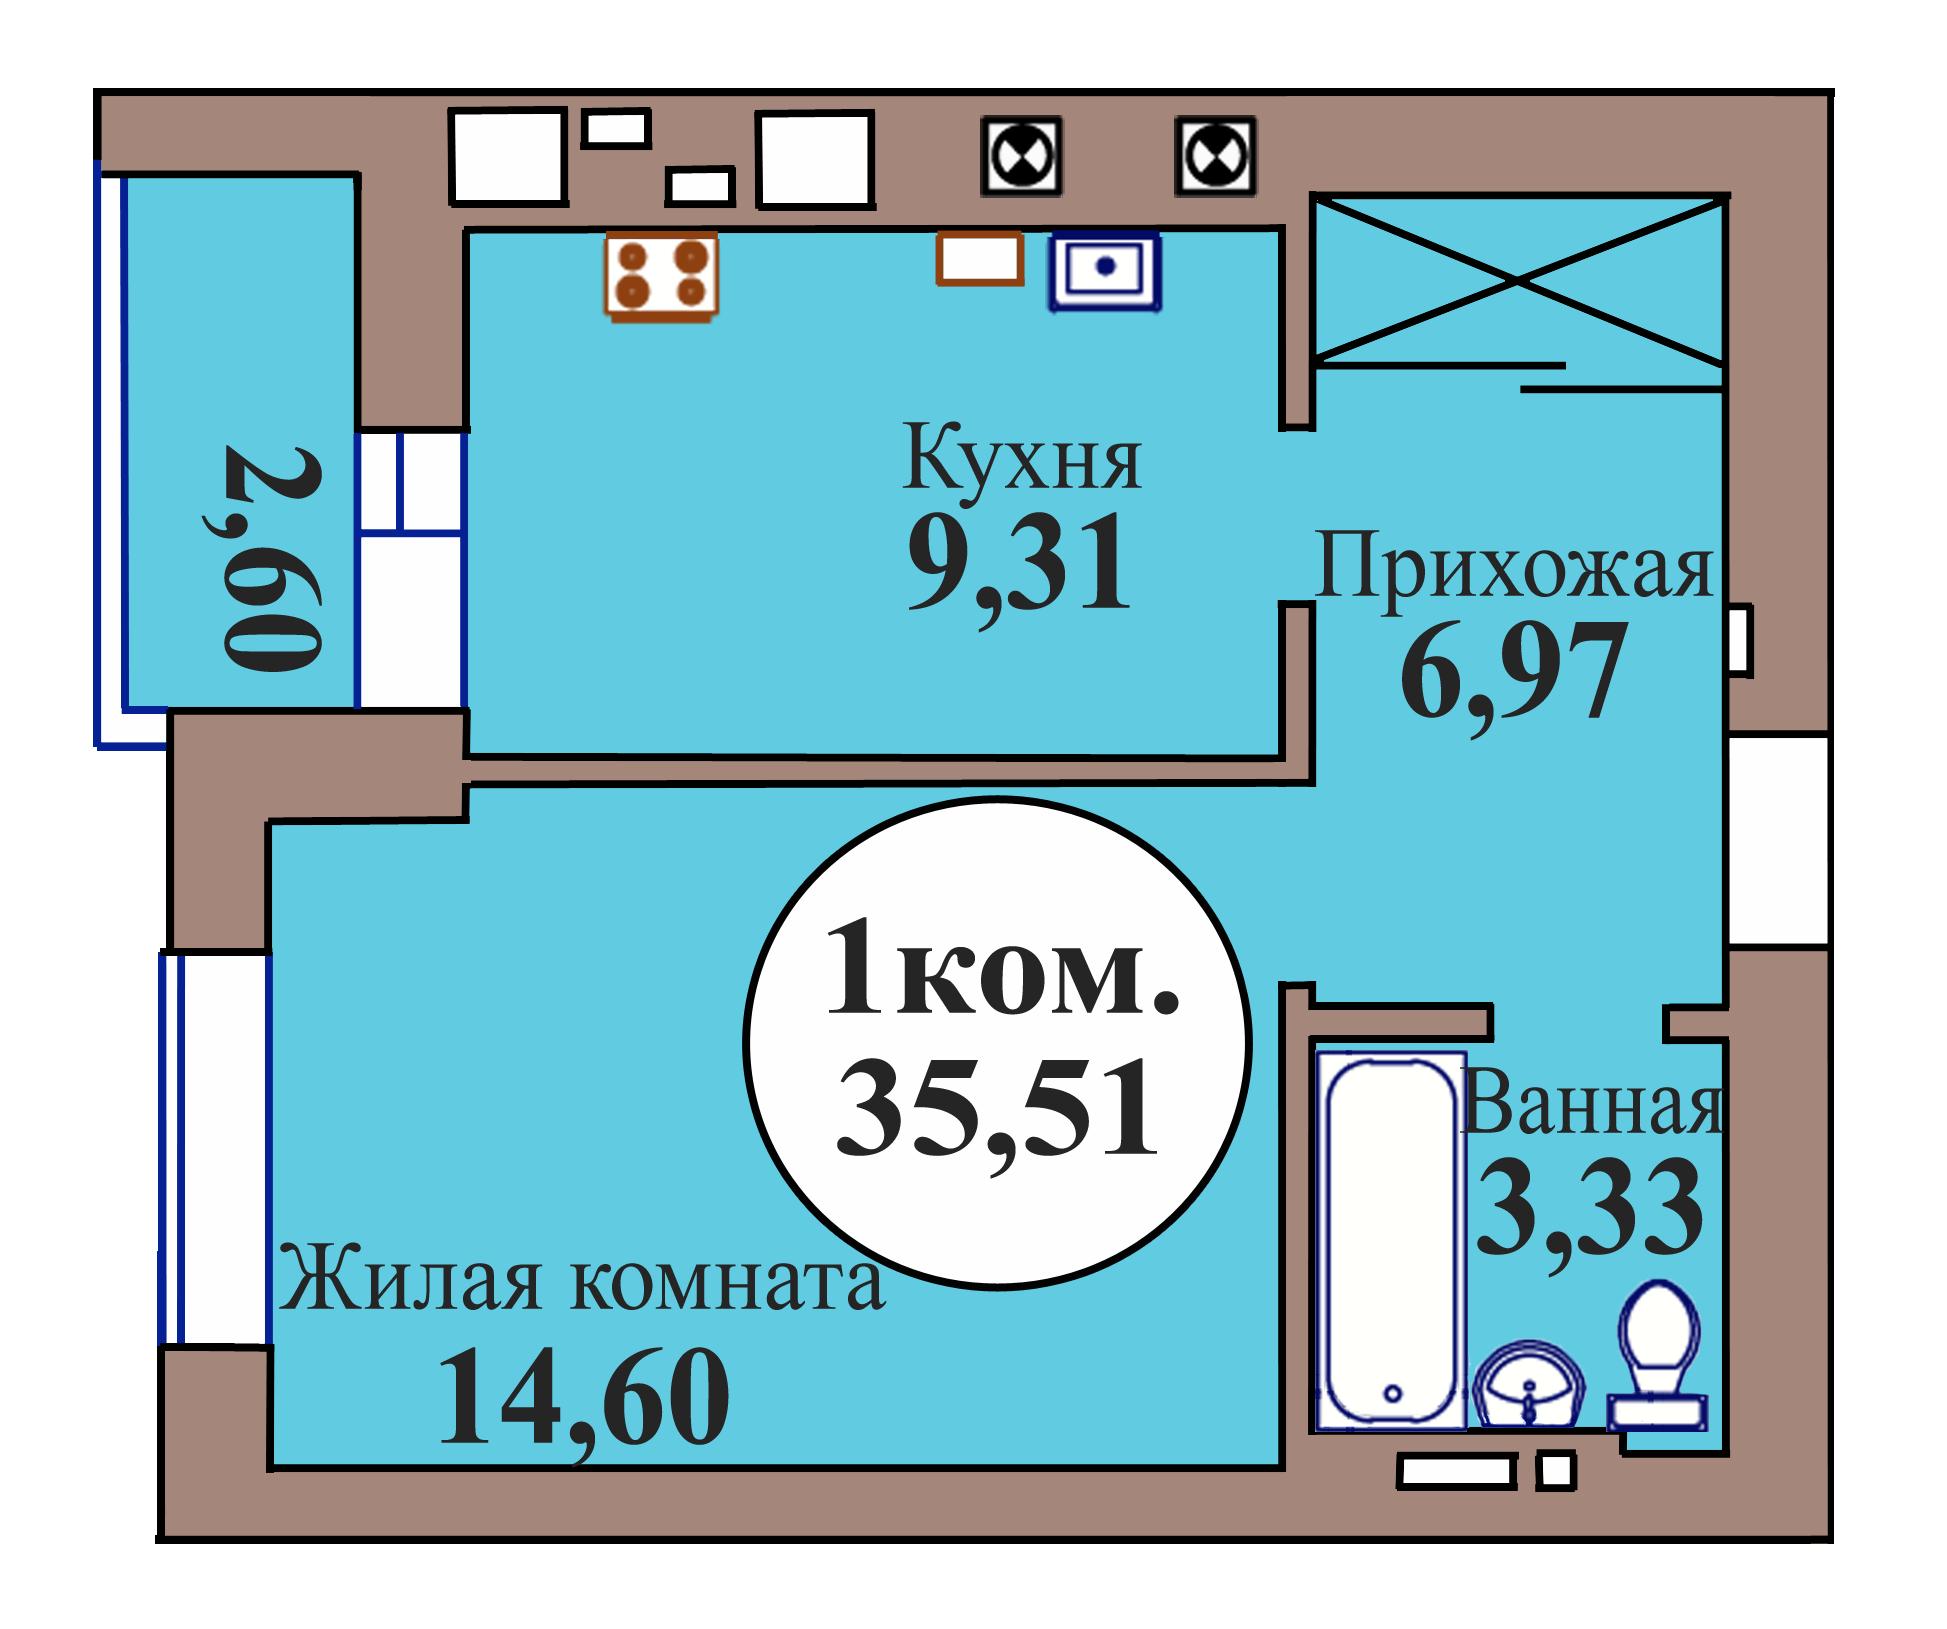 1-комн. кв. по пер. Калининградский, 5 кв. 30 в Калининграде